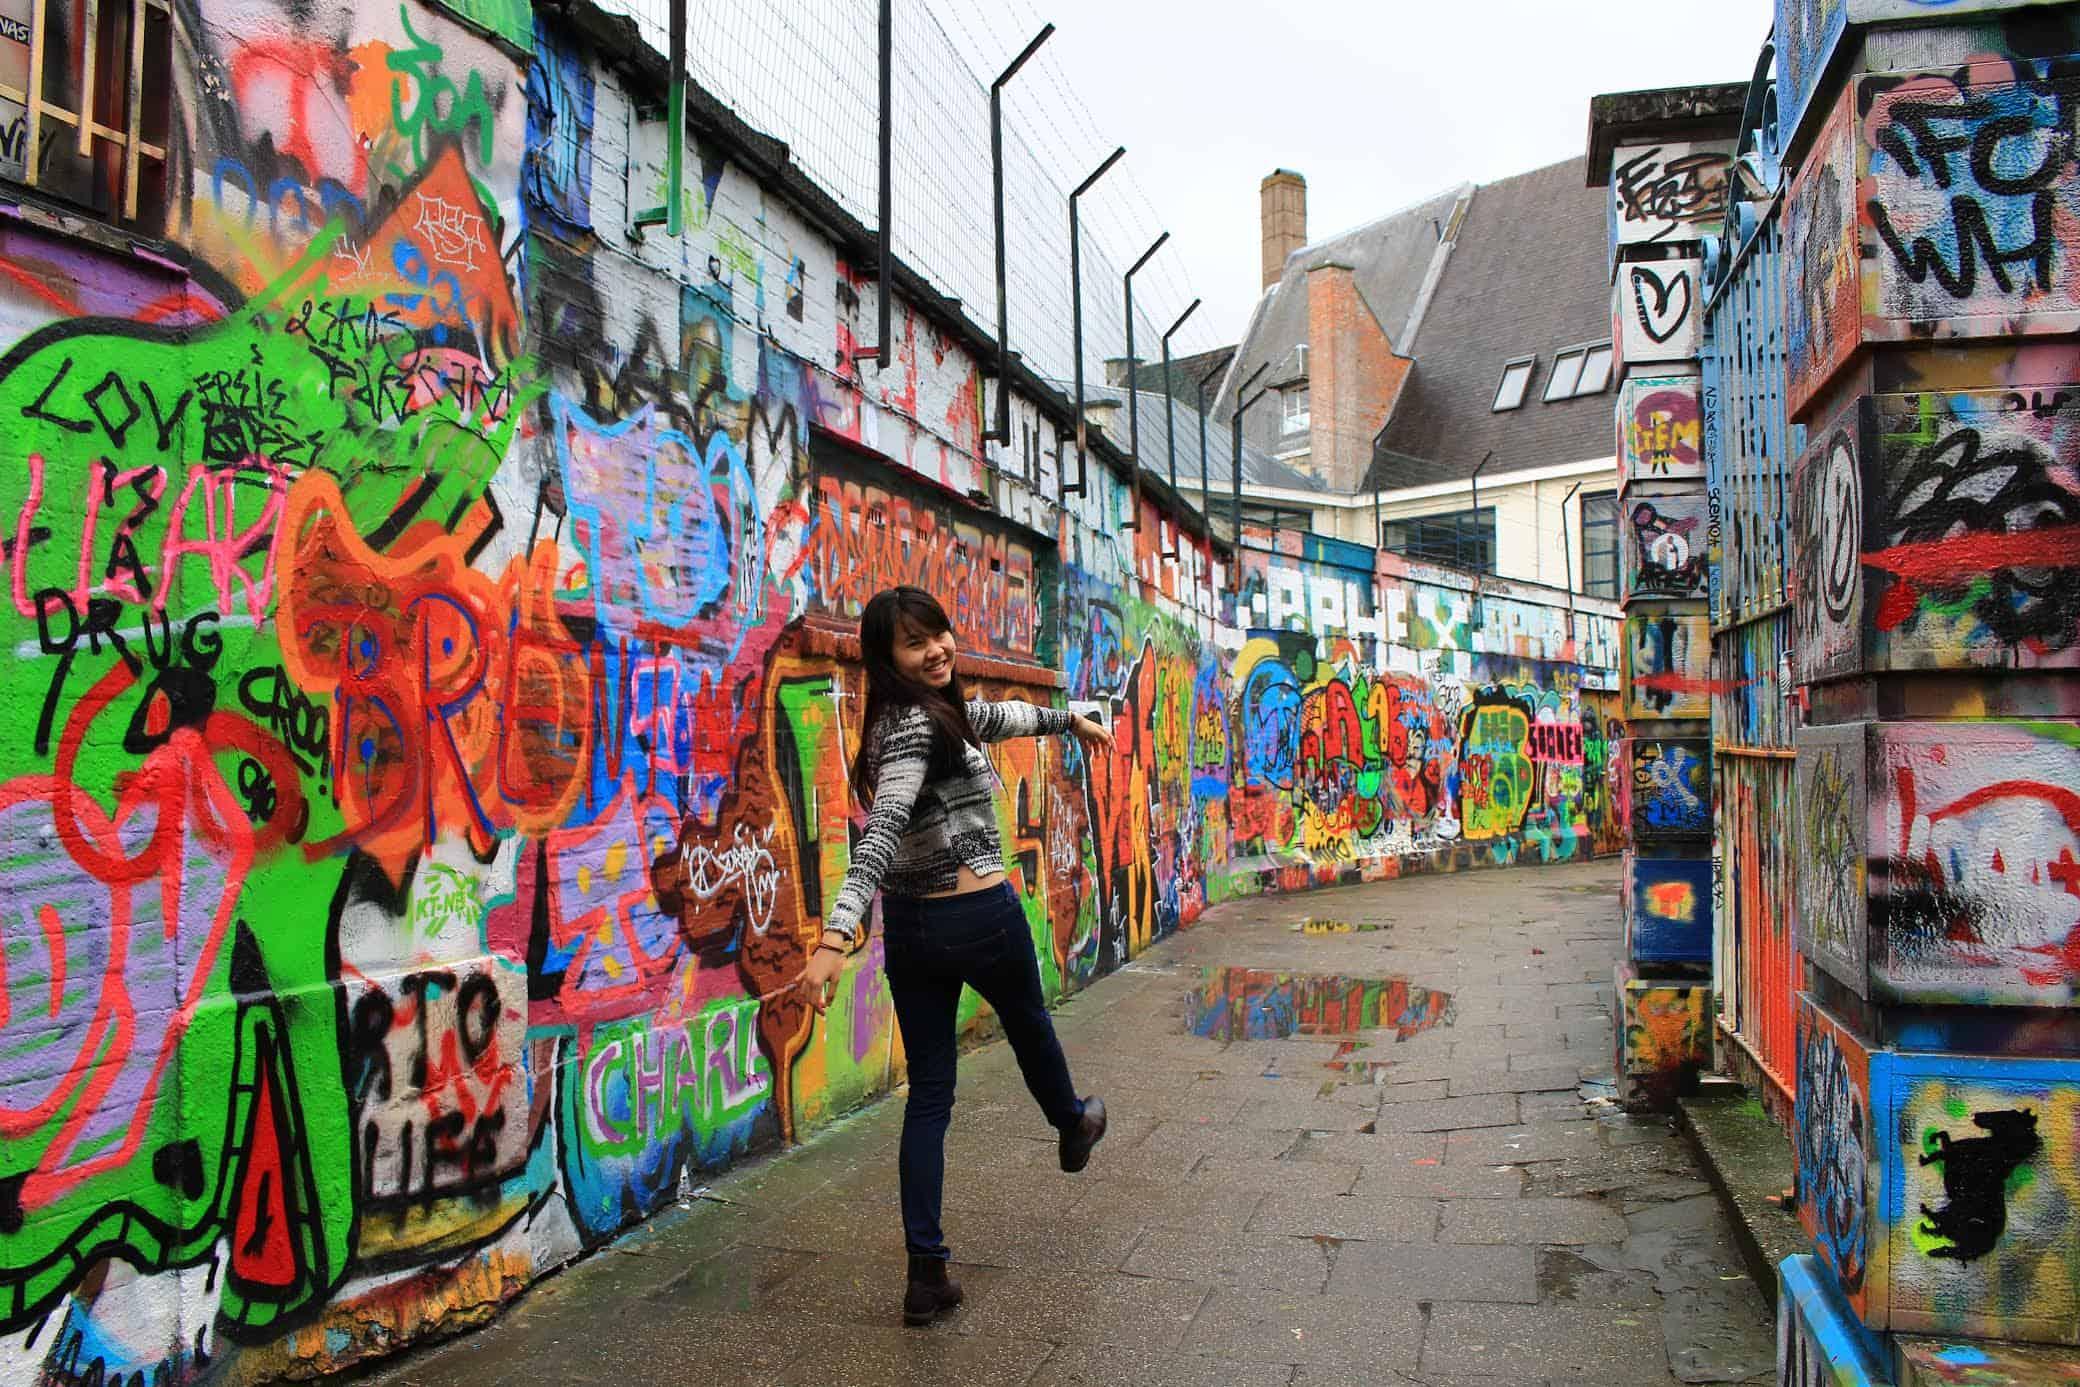 asian girl standing near graffiti in ghent, belguim